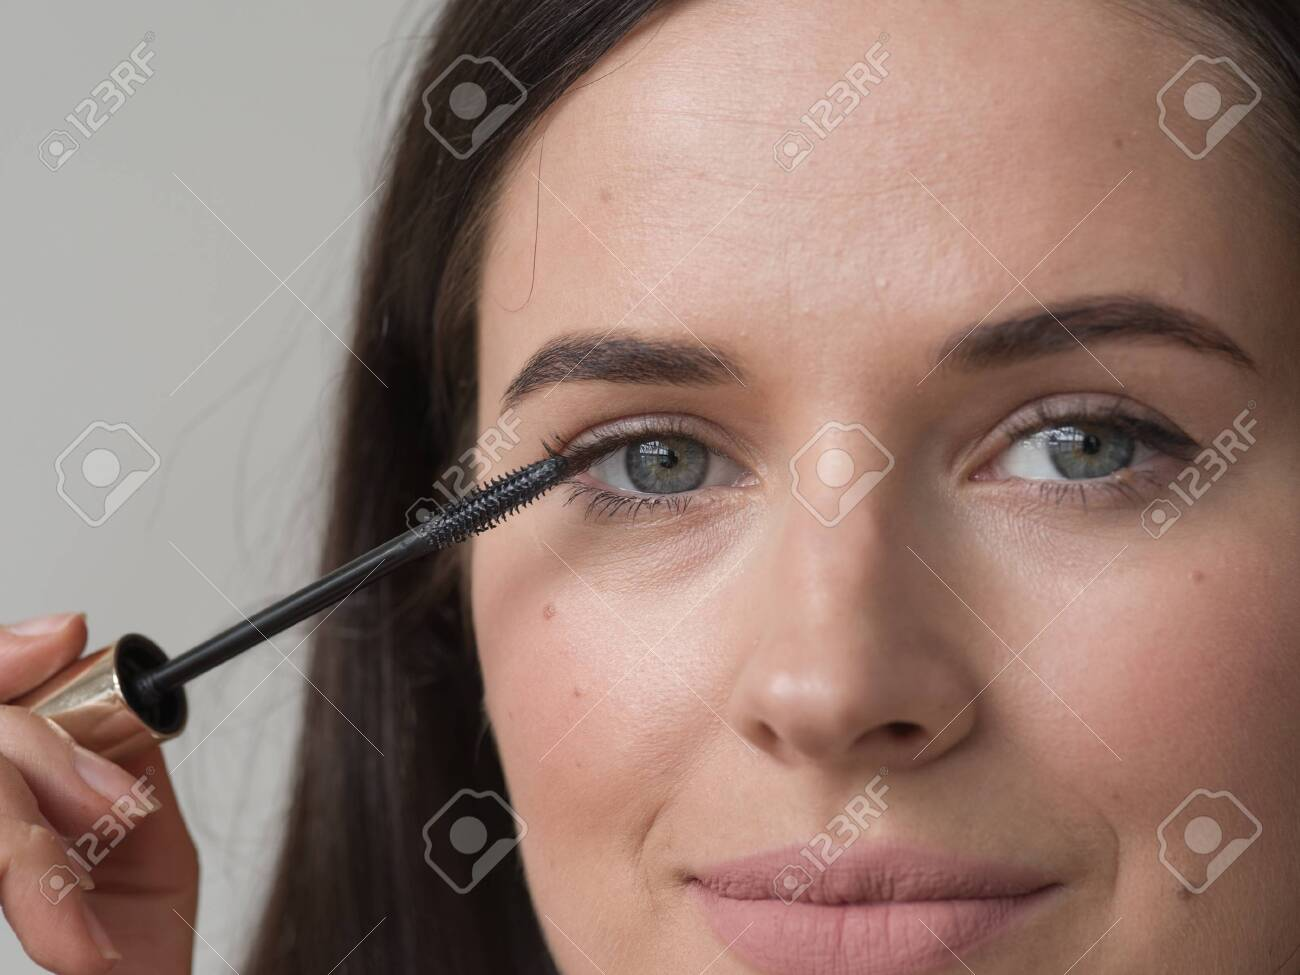 Woman makeup mascara eyes healthy skin natural fashion makeup. Studio shot. - 143642487